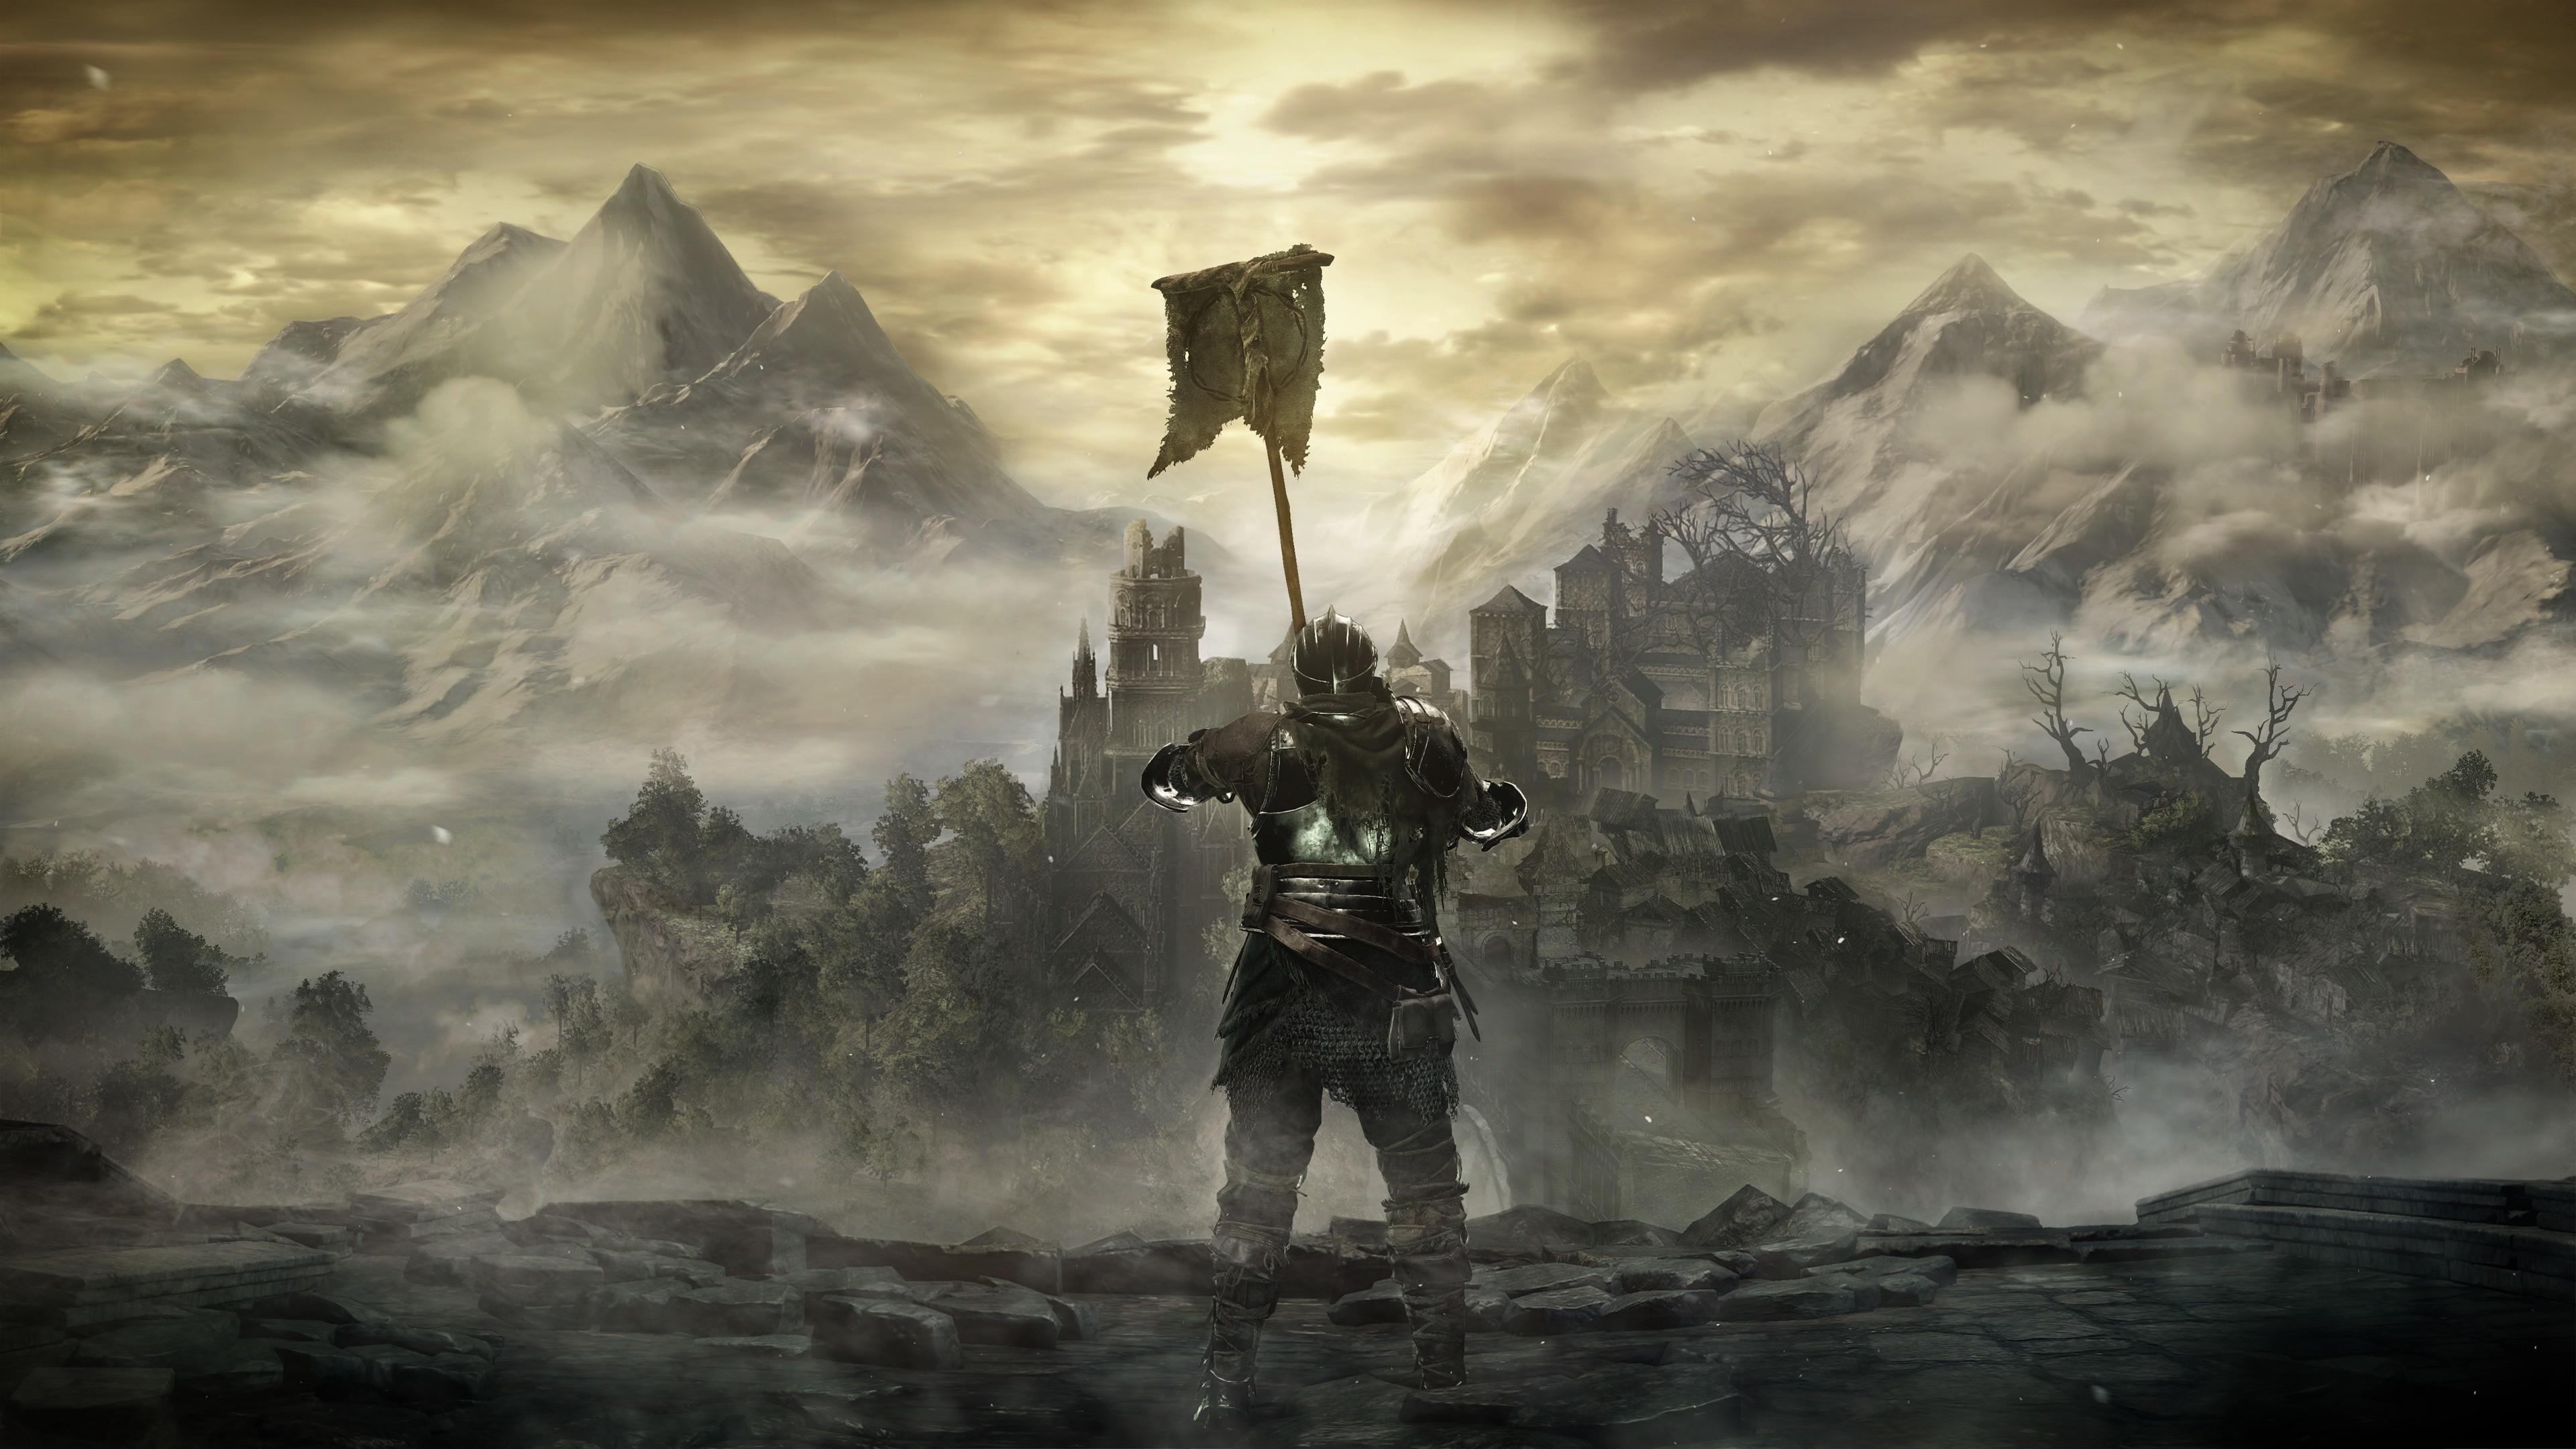 Dark Souls 3 Wallpaper Quote Dark Souls Iii Dark Souls Dark Gothic Midevil Knights